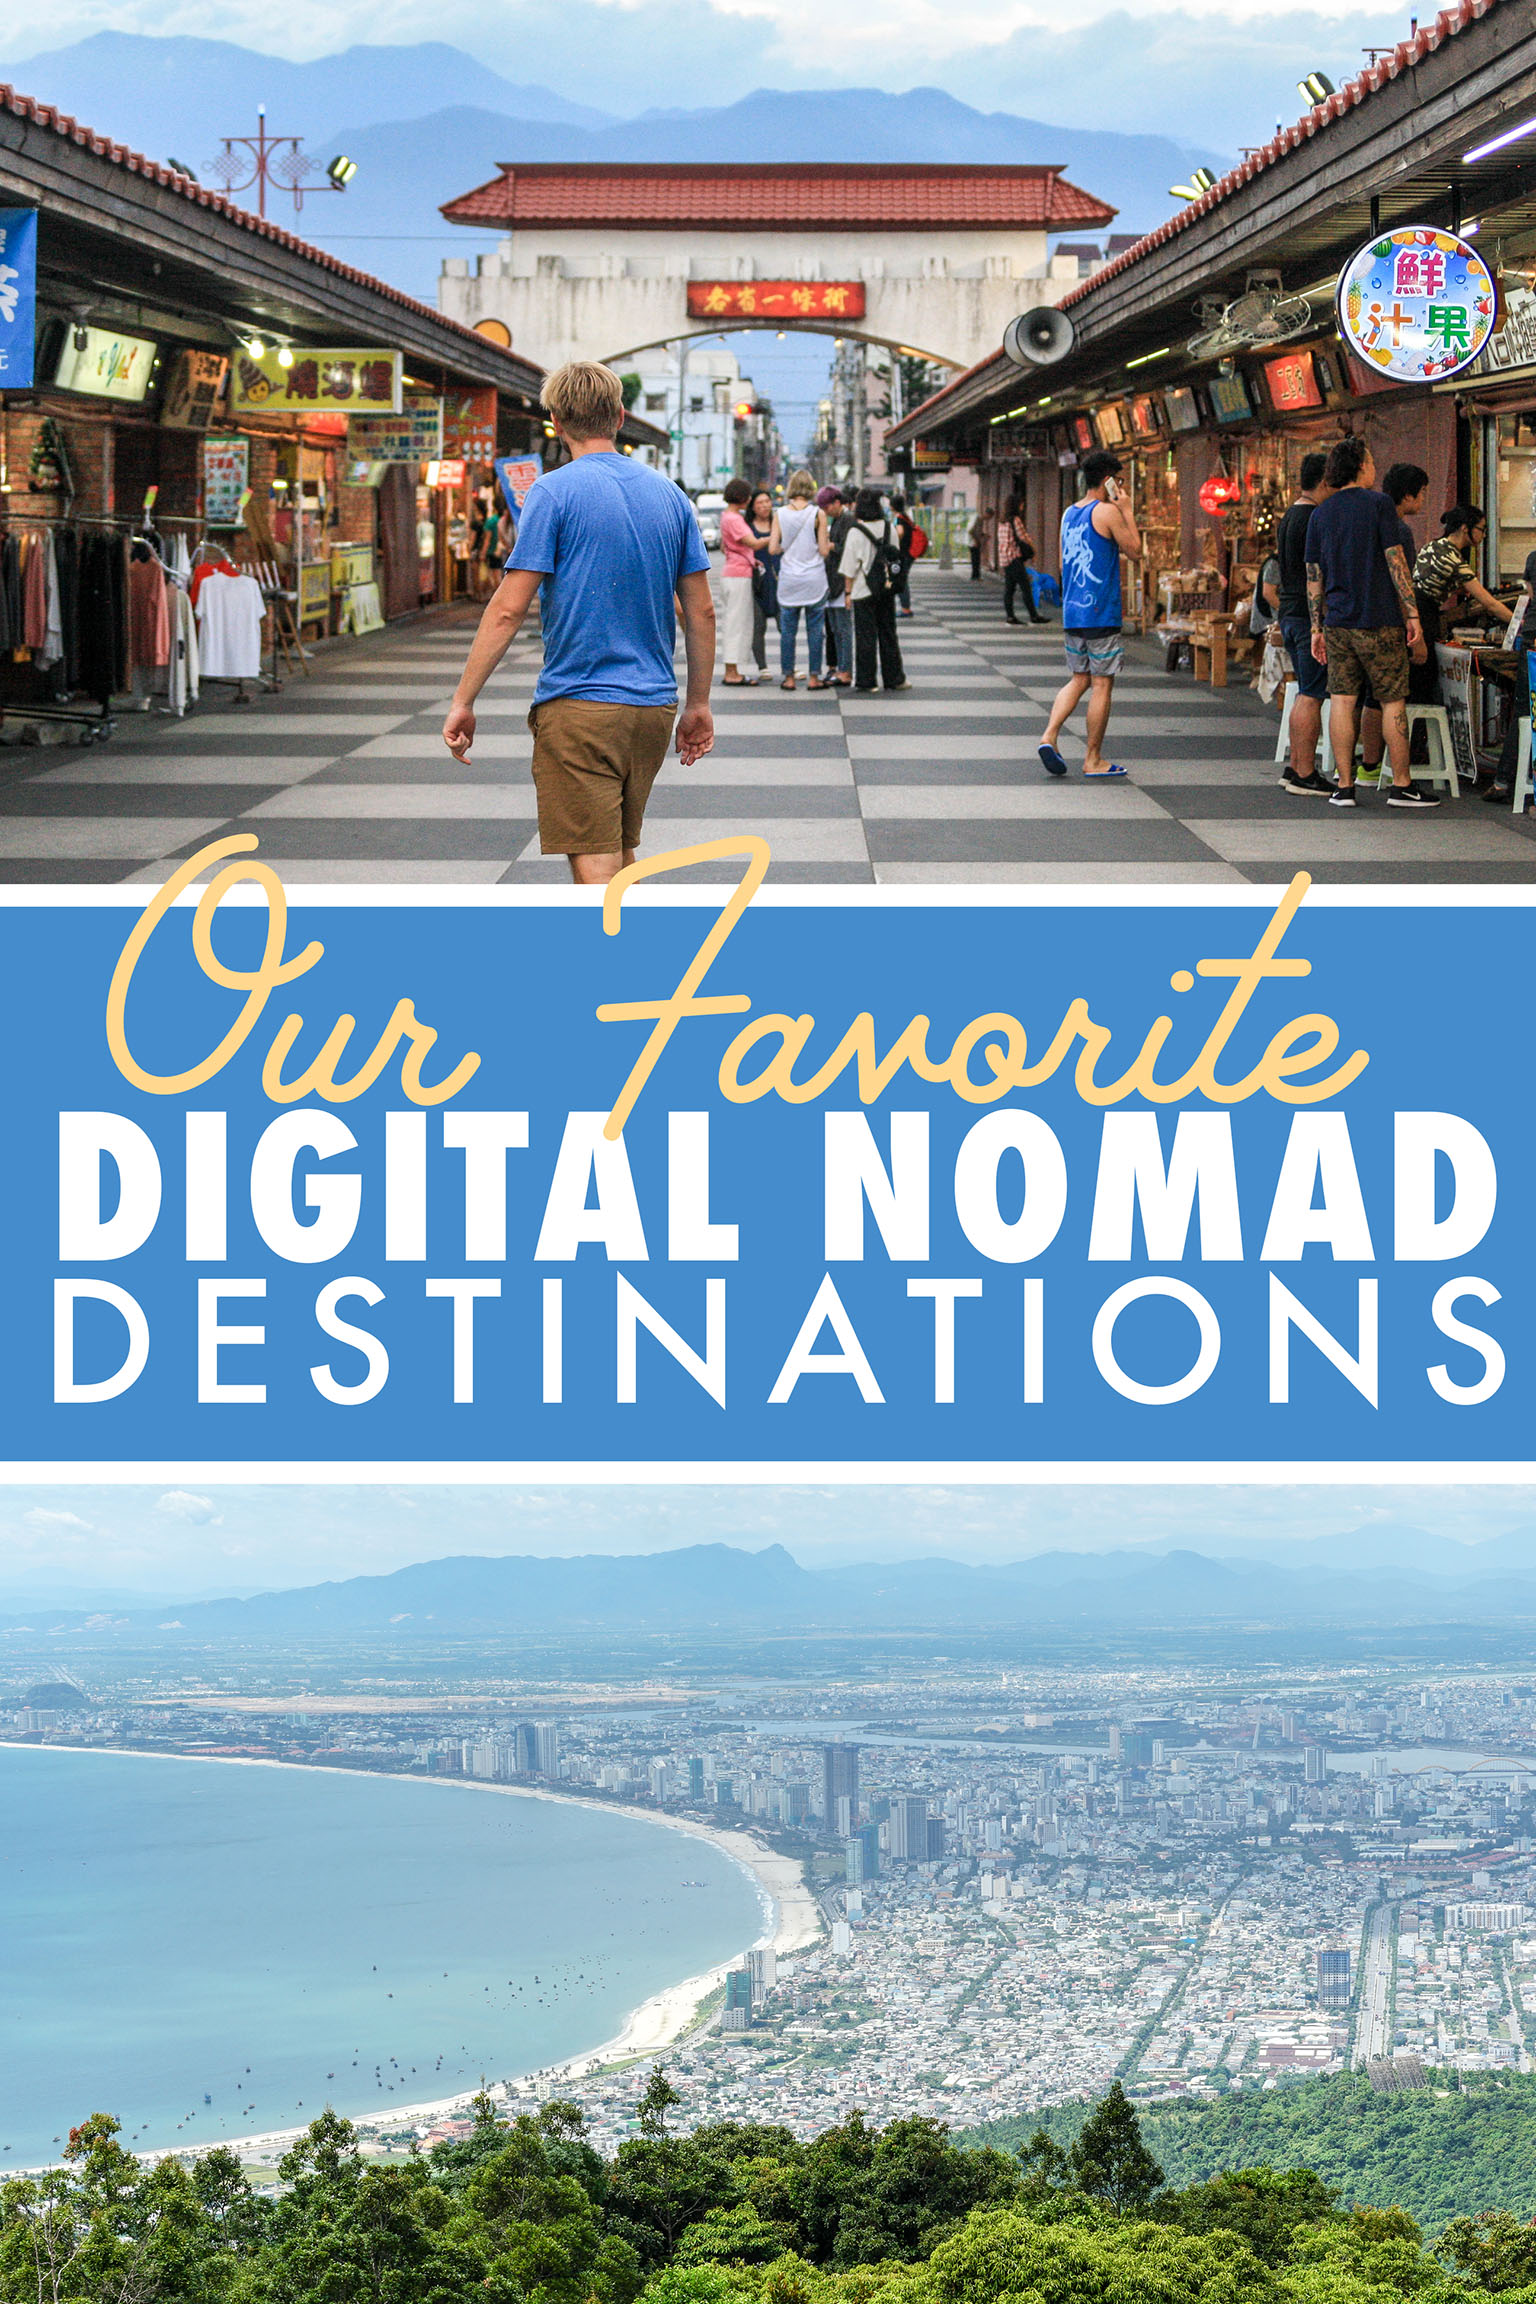 The Best Digital Nomad Destinations around the world